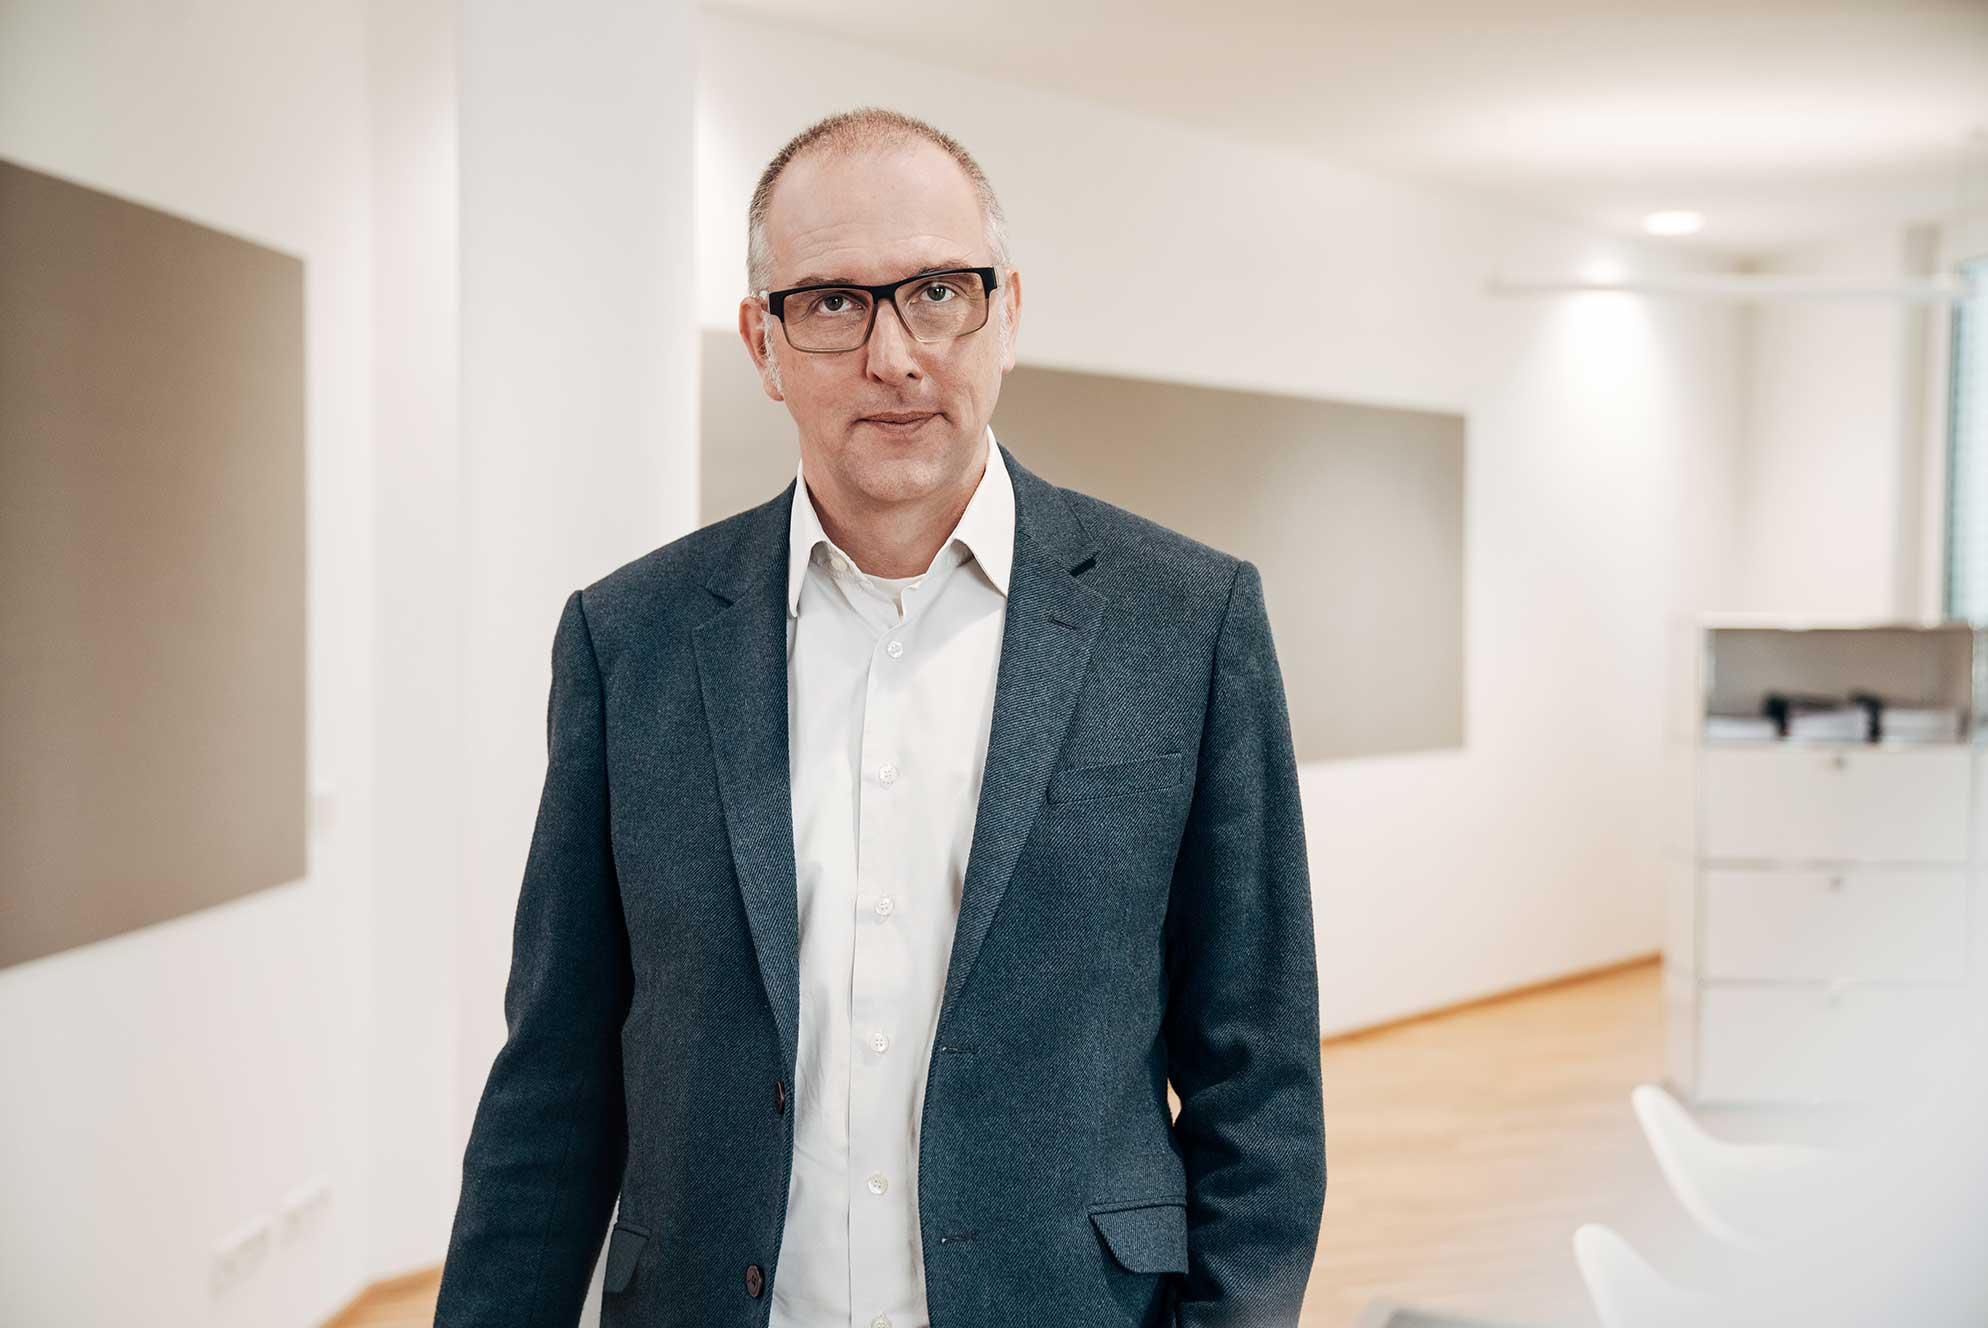 Gregor Regensberger, Senior Brand Manager Beratung bei der Markenagentur Lighthouse®